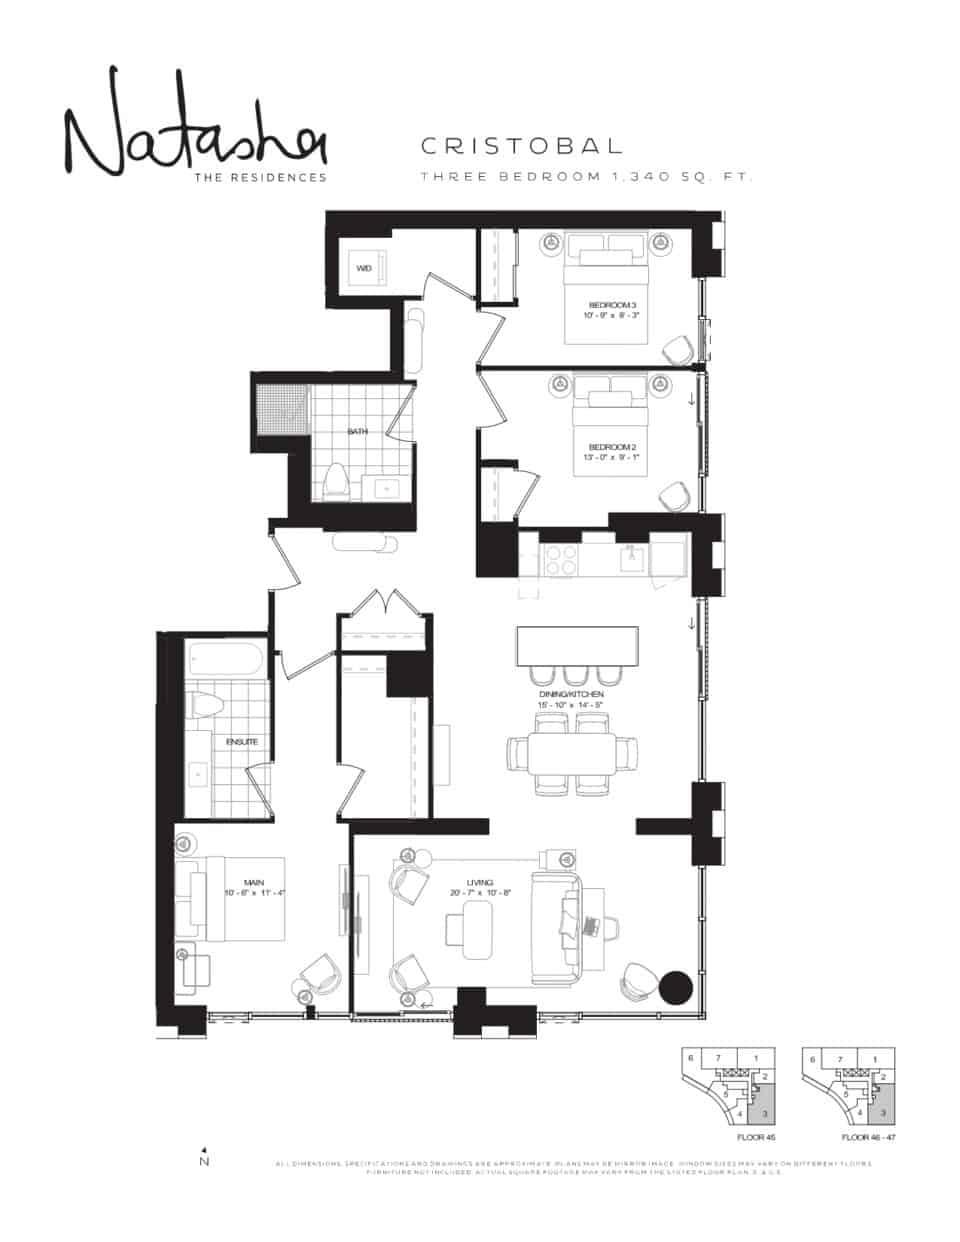 2021 09 02 11 02 11 natashatheresidences lanterradevelopments floorplans cristobal